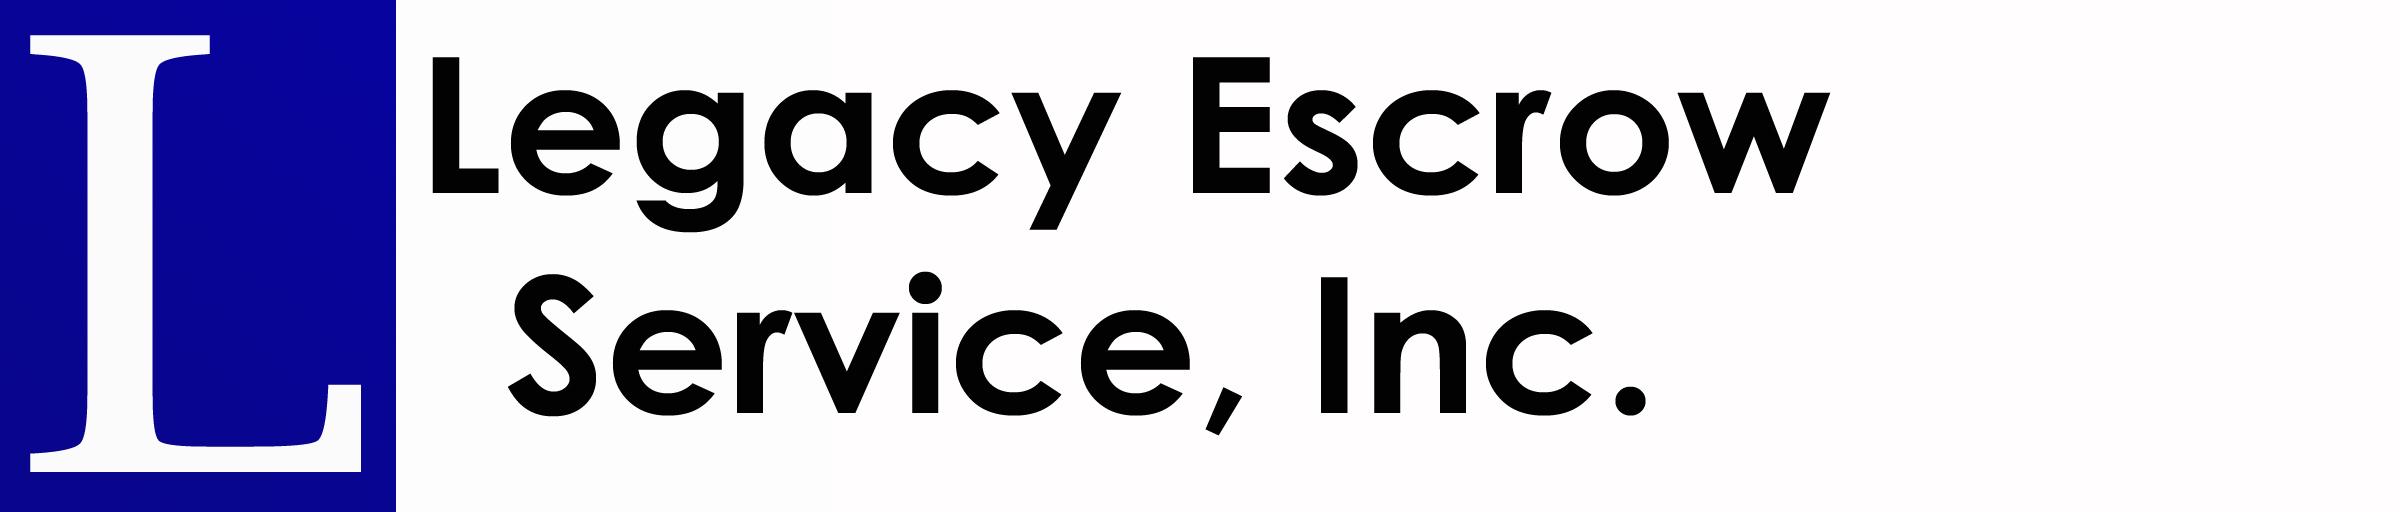 Legacy Escrow Service